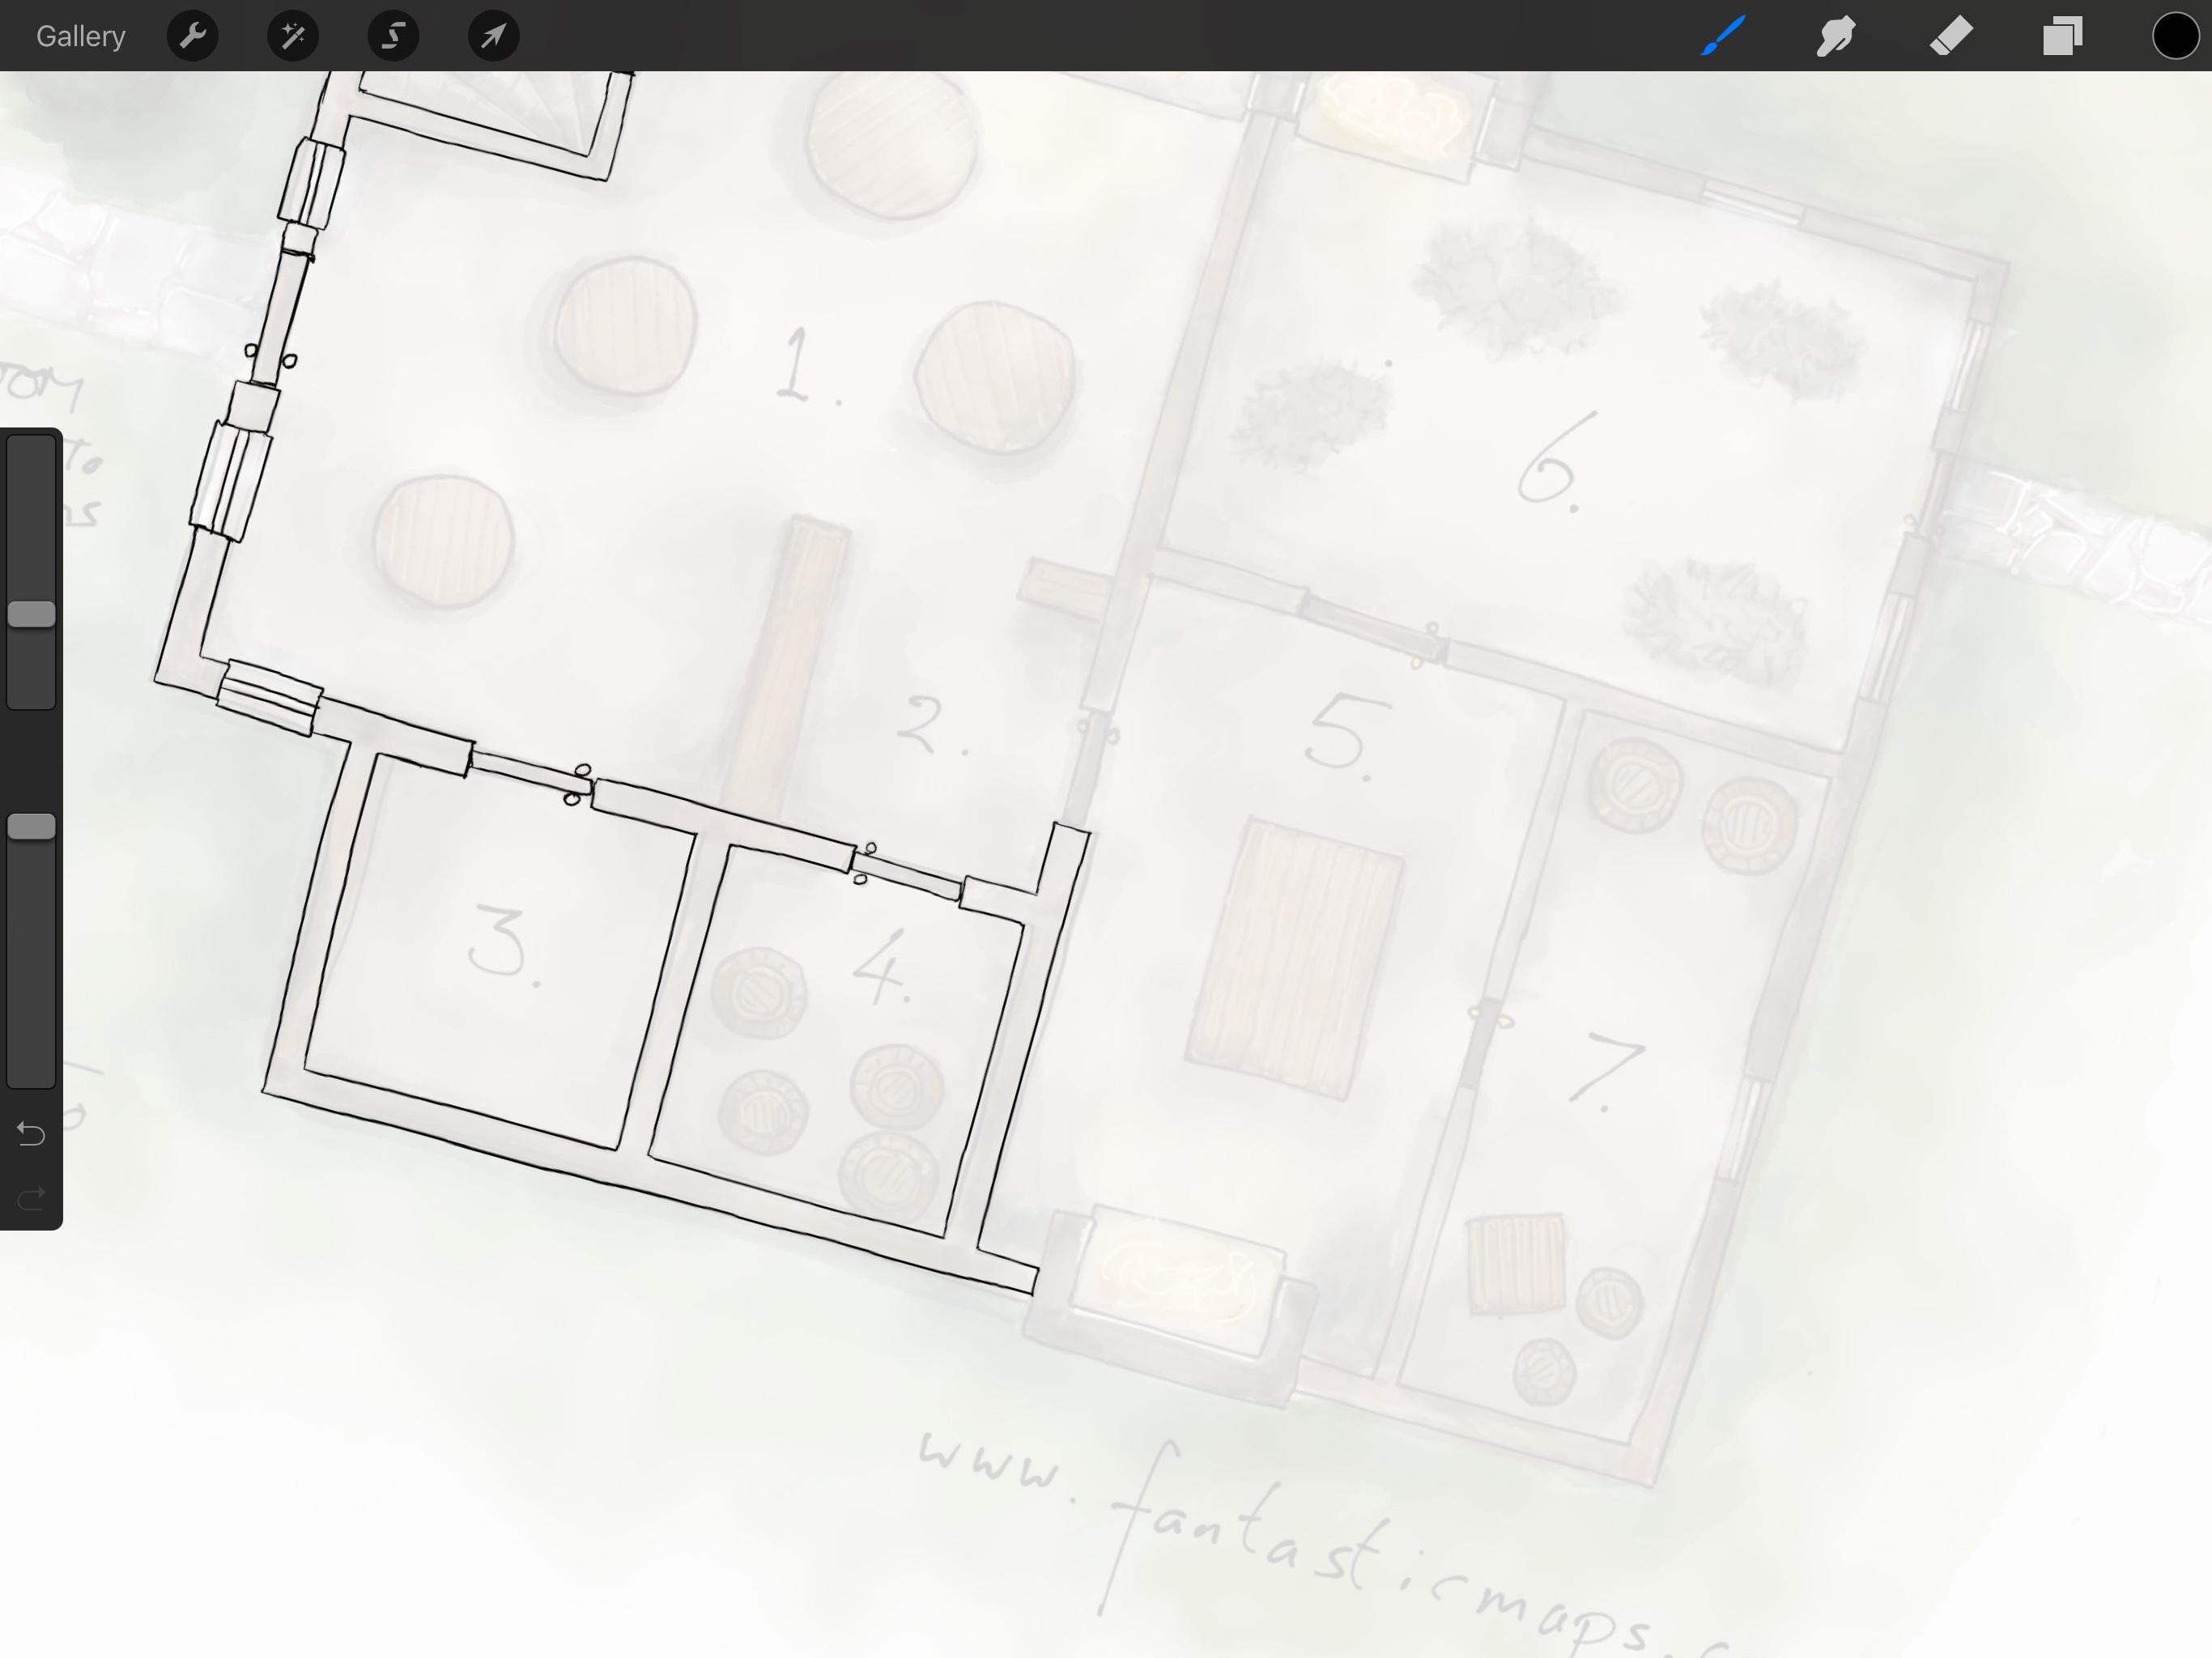 how to draw on procreate ipad pro